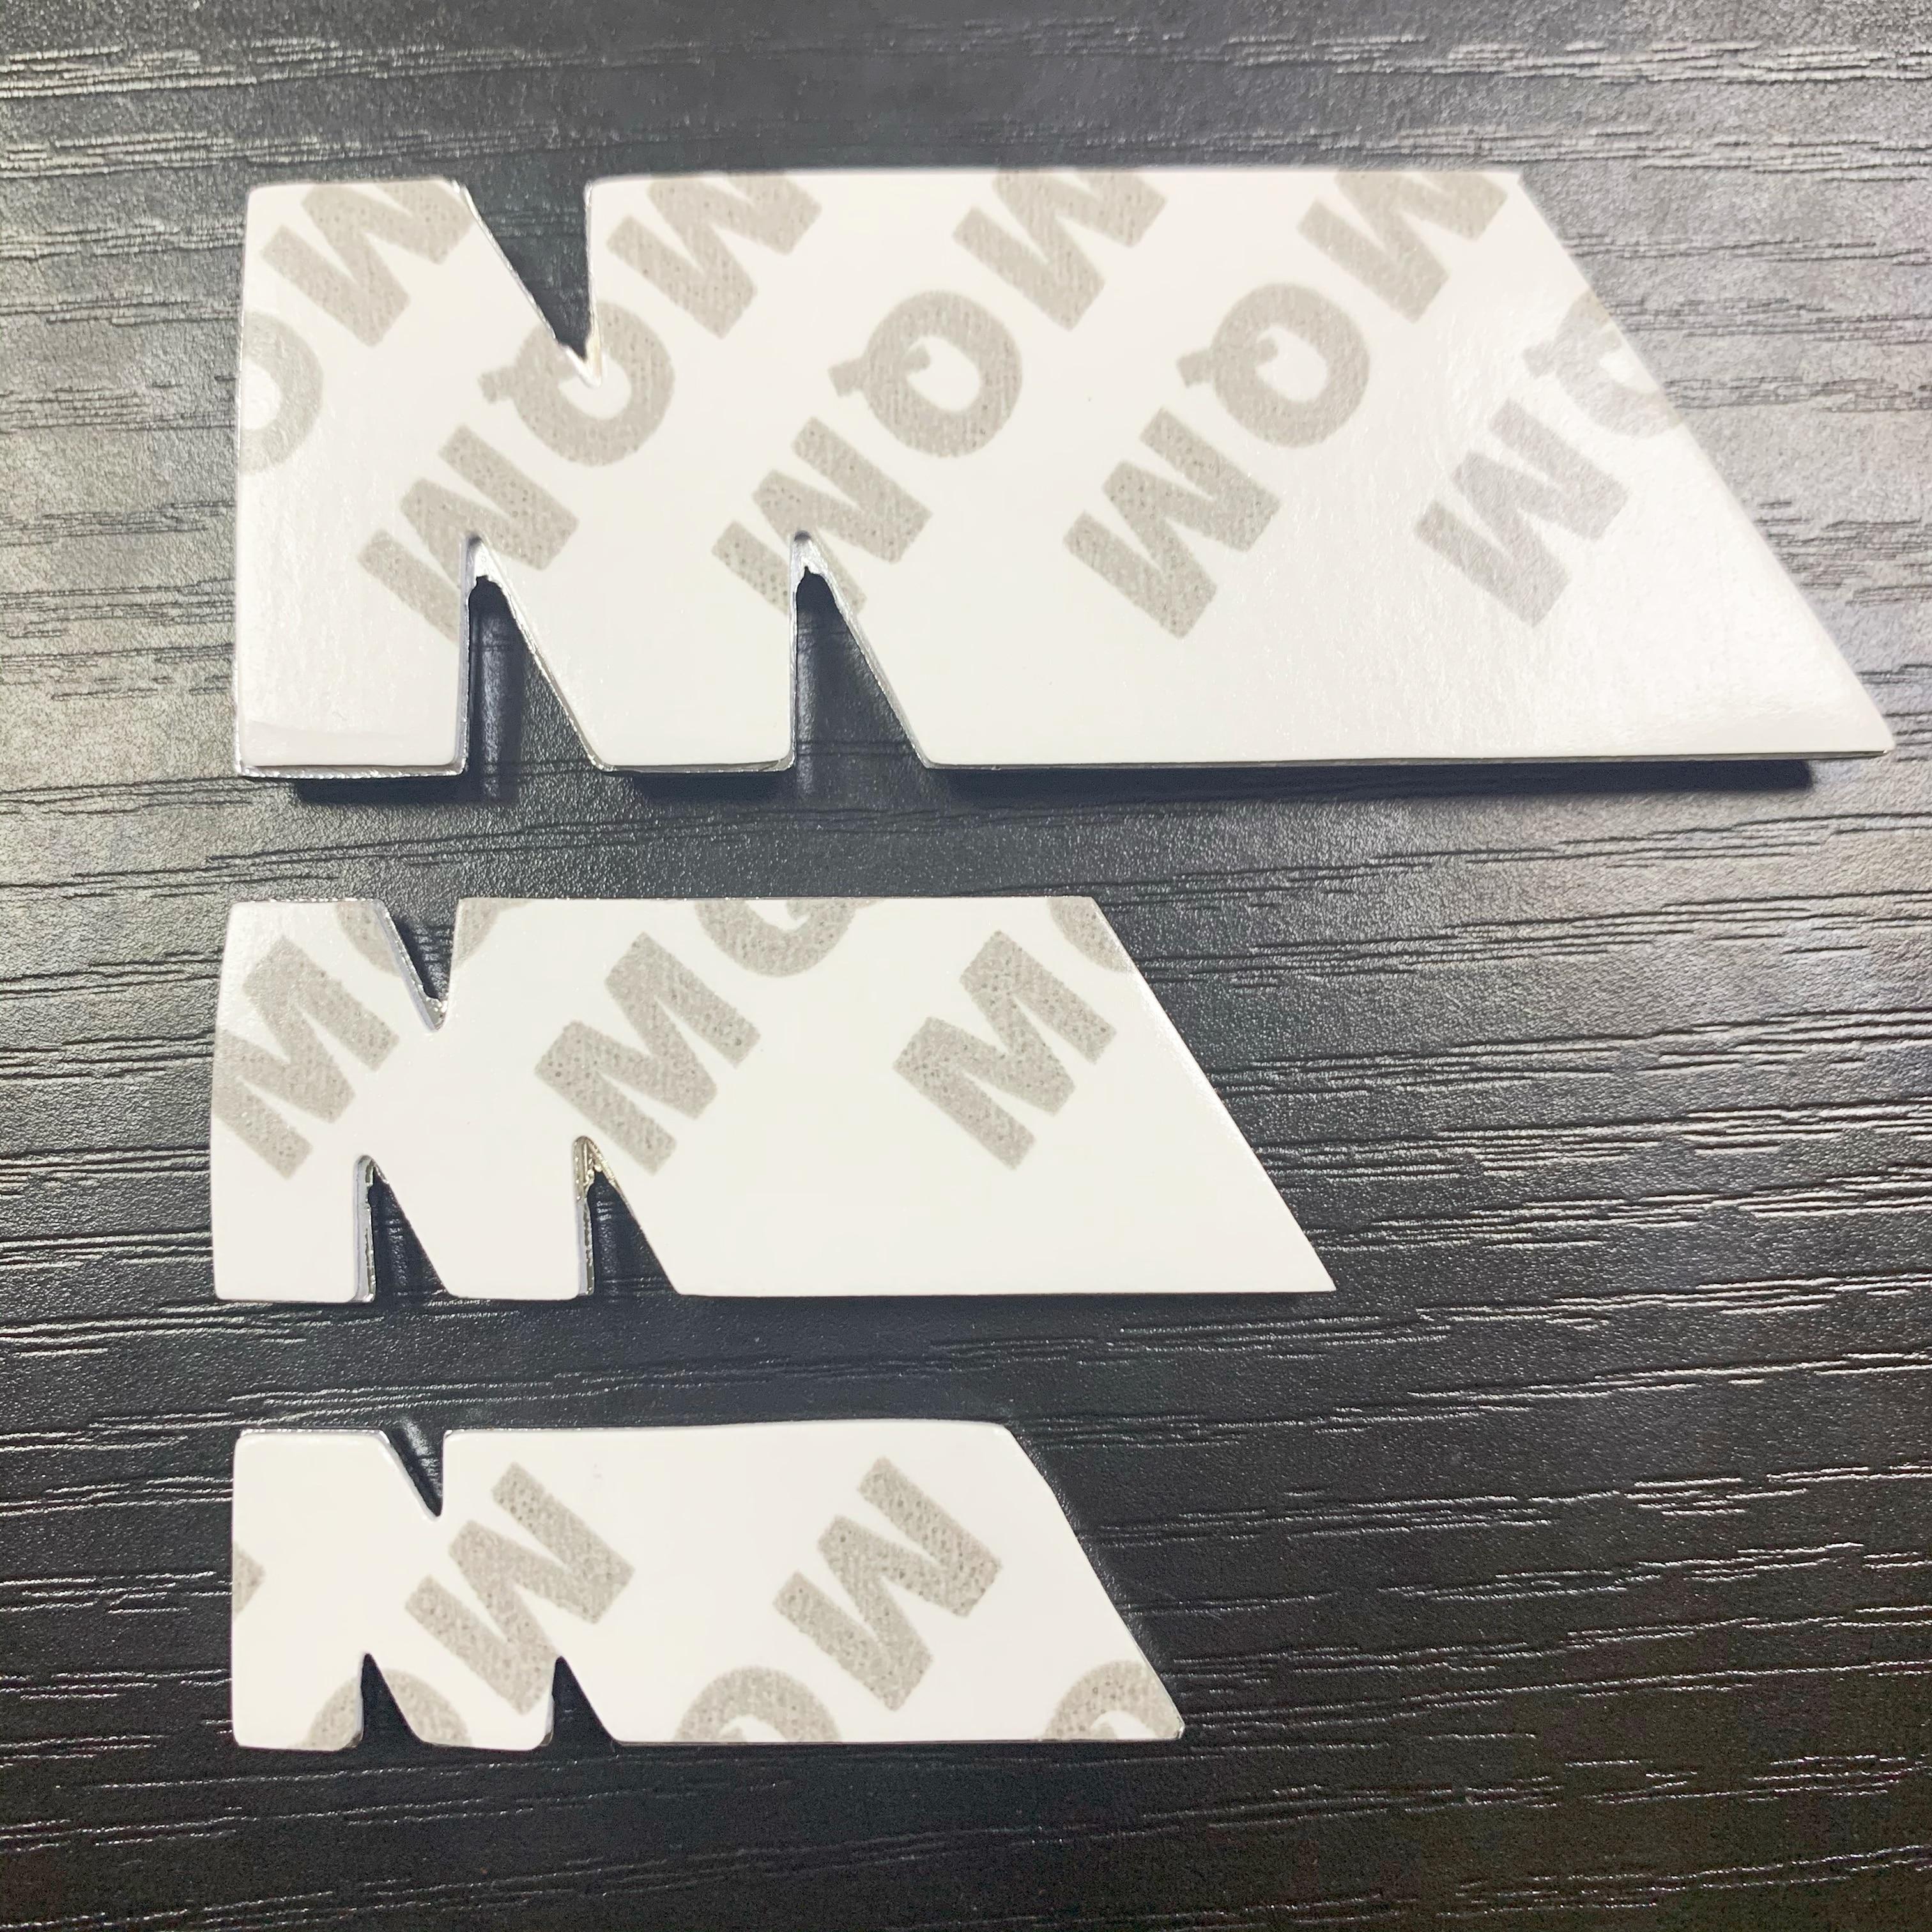 3 tamaños cromado negro plateado Metal M potencia emblema de placa de coche 3D Metal M Logo pegatinas parrilla para BMW CAR Styling dropshipping